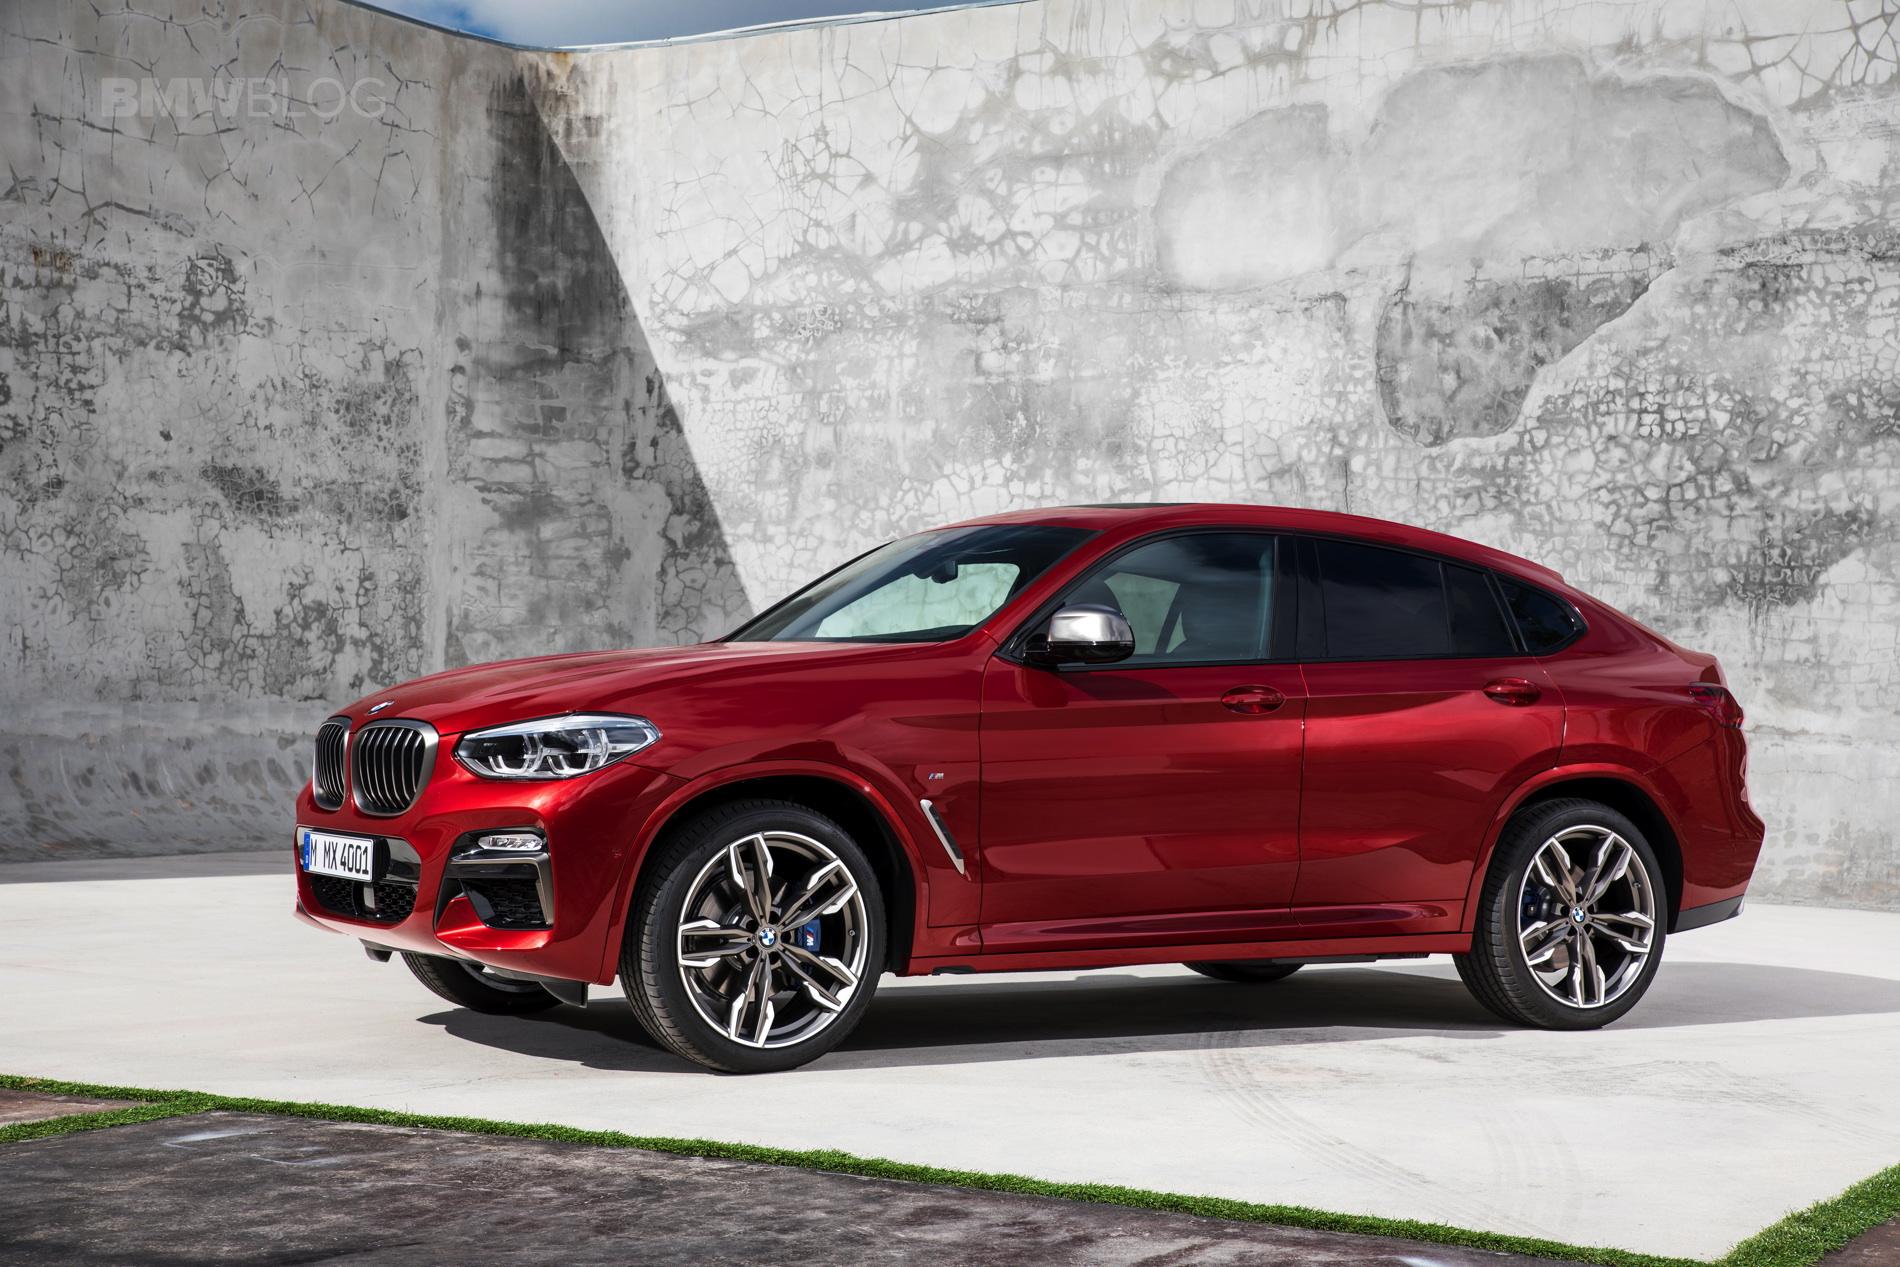 New 2018 BMW X4 M40d exterior design 31